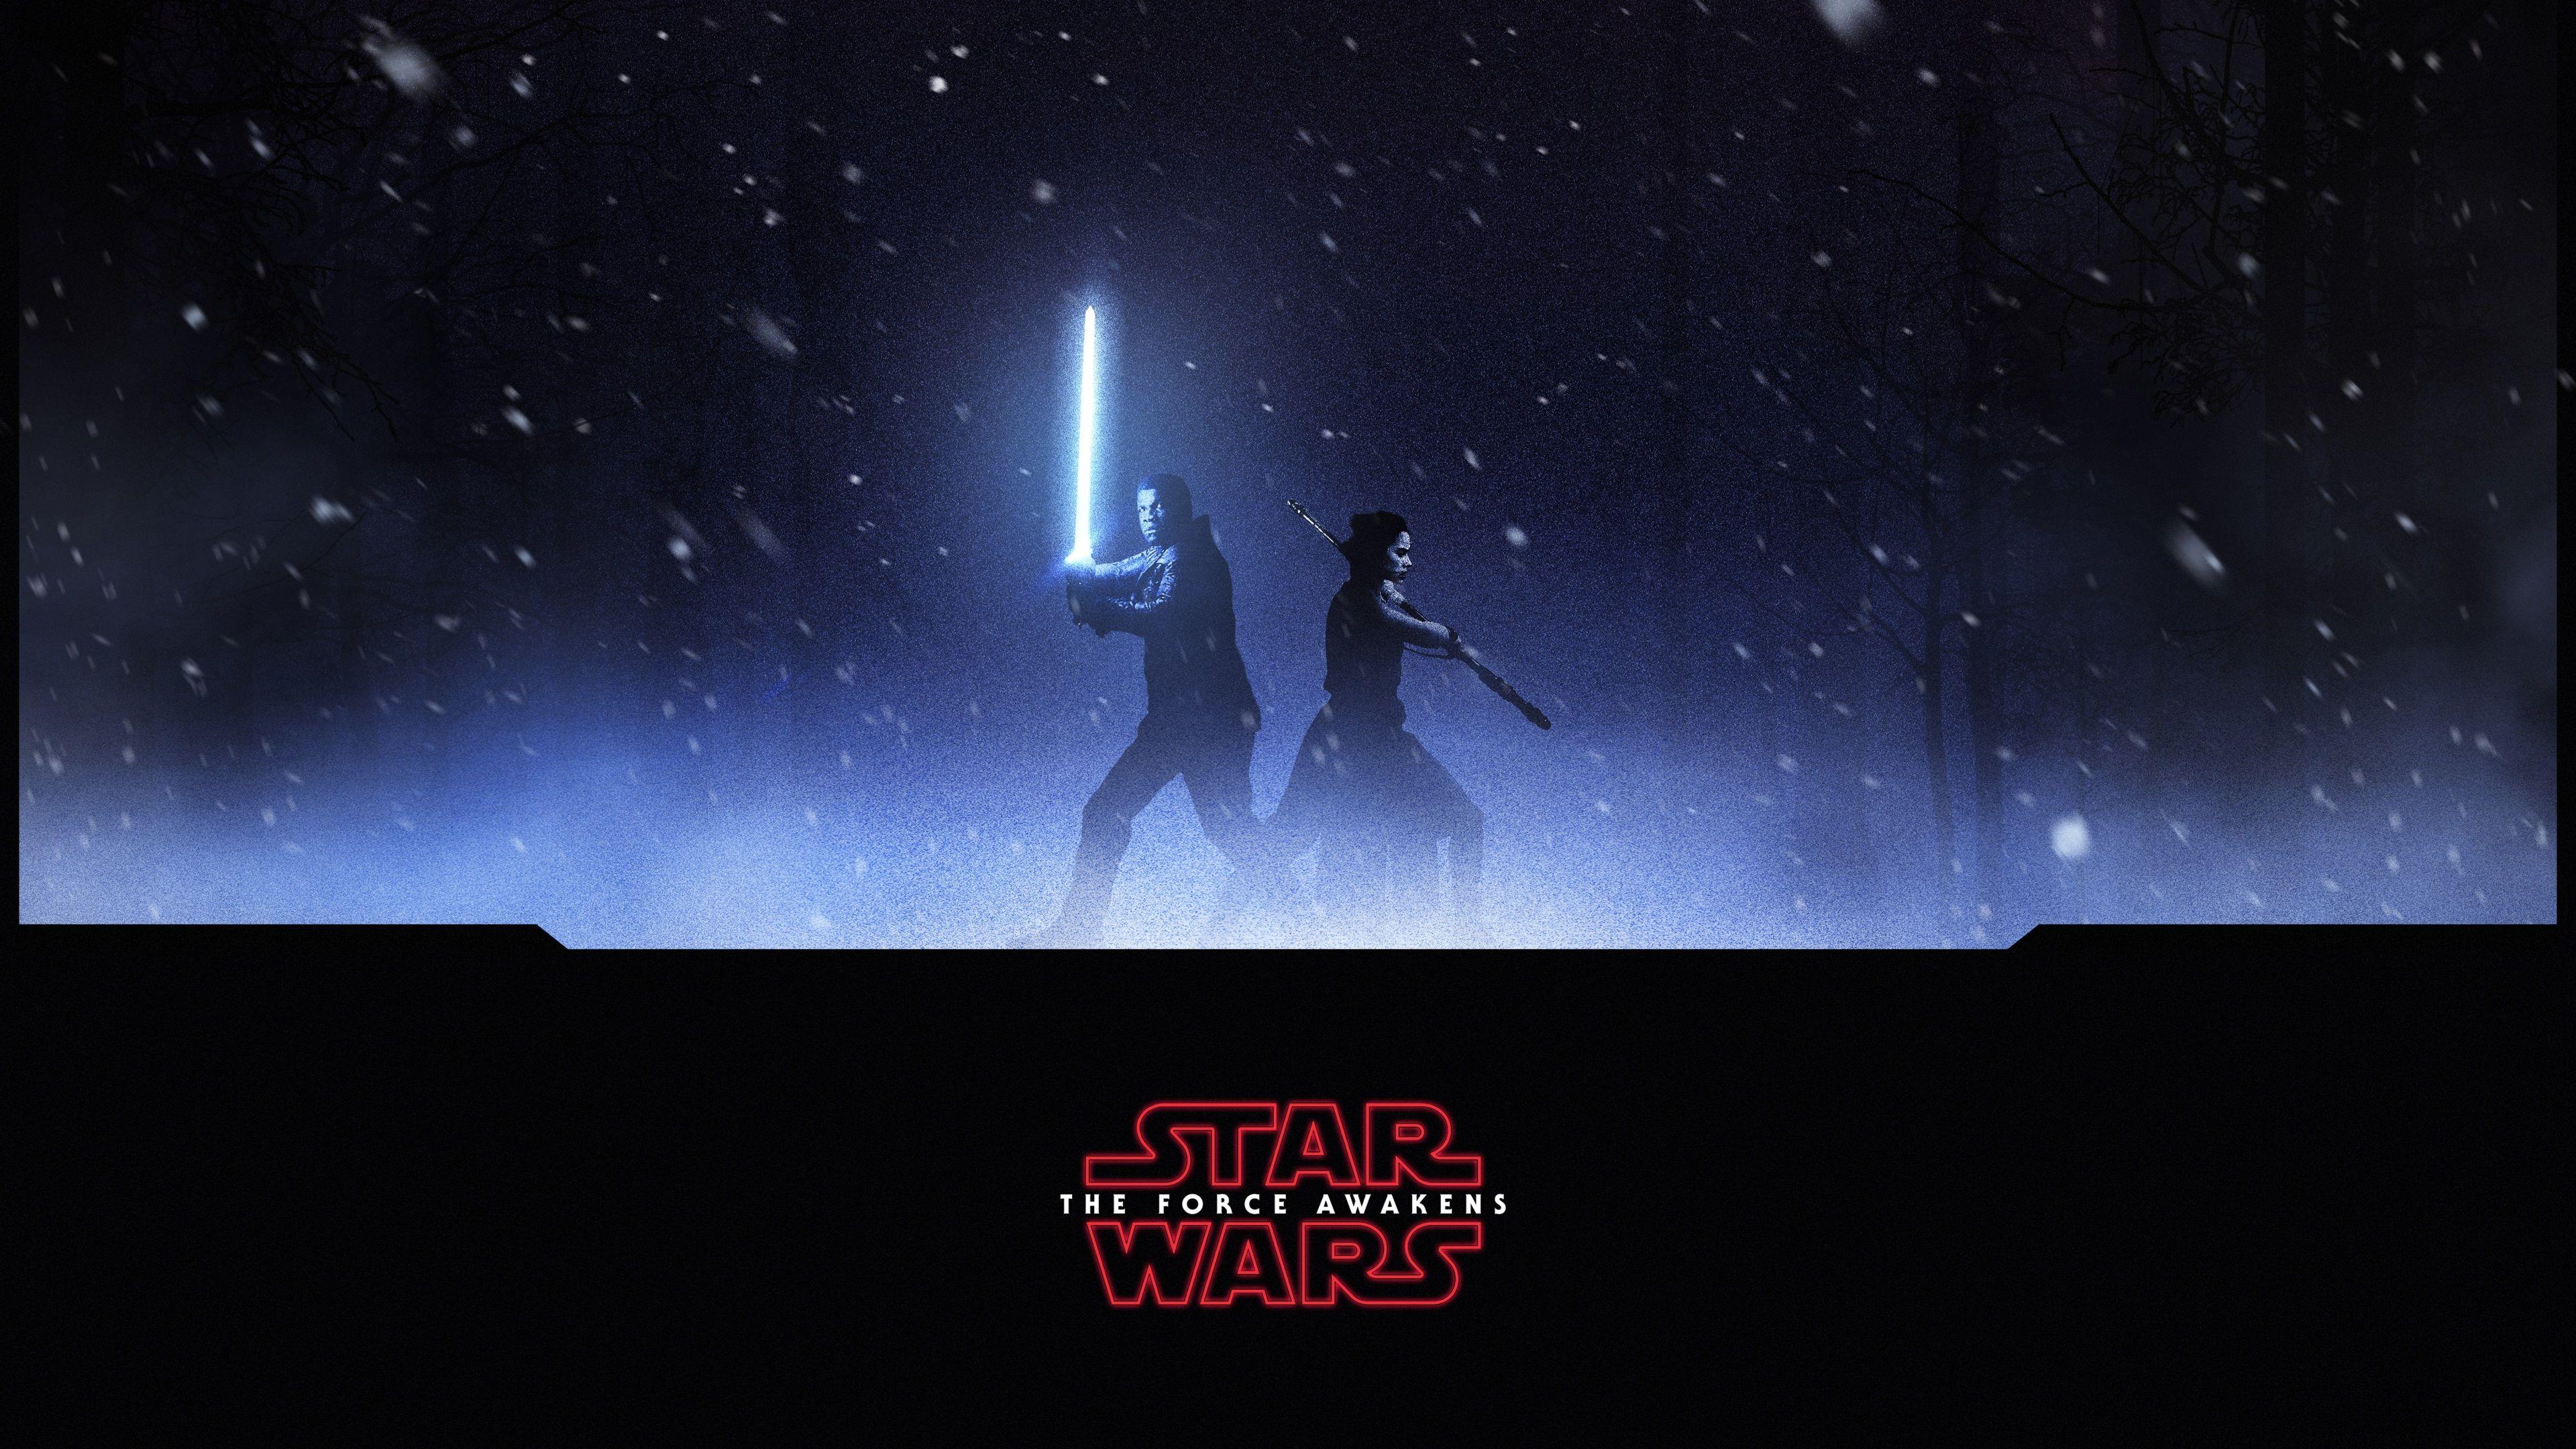 3840x2160 star wars the force awakens 4k hd high